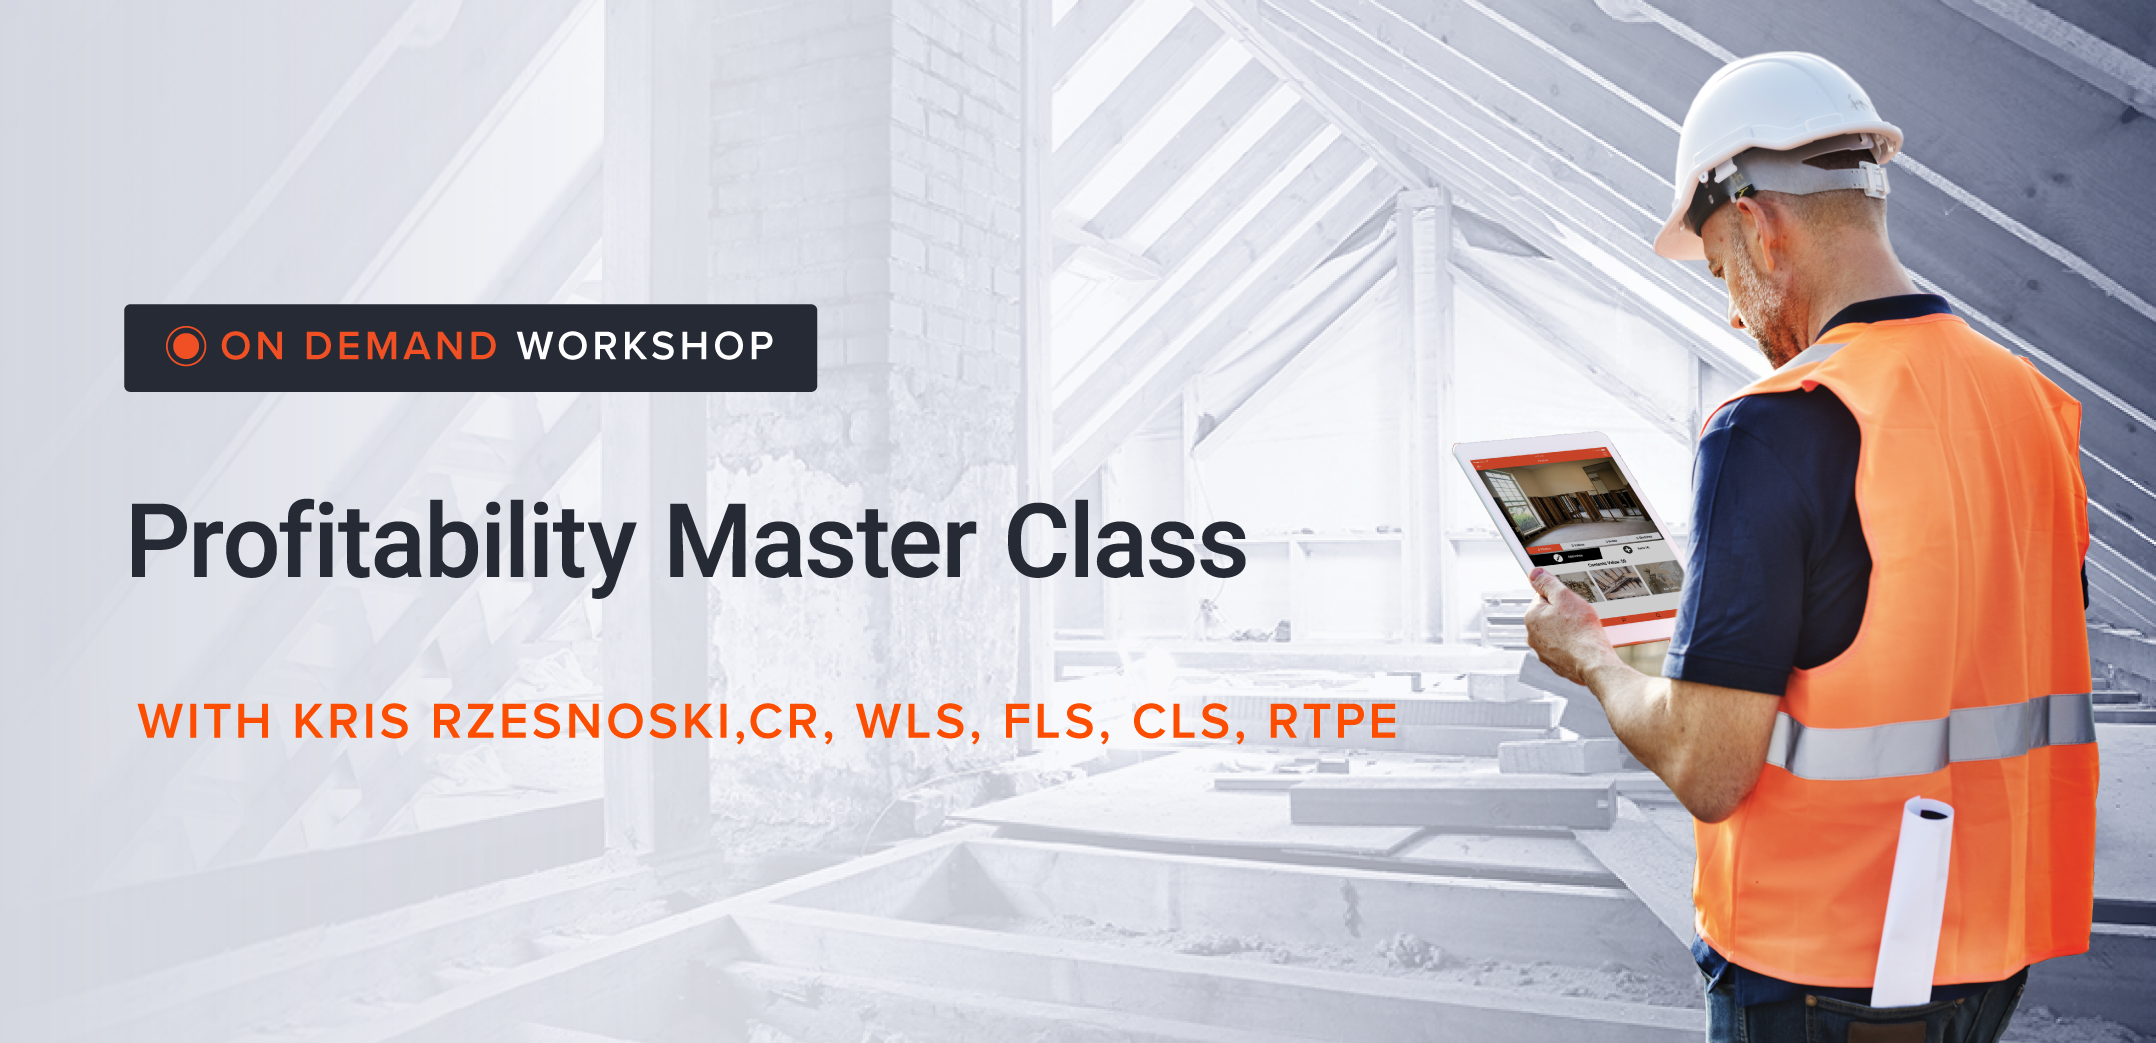 1a-Intro-Profitability-Master-Class